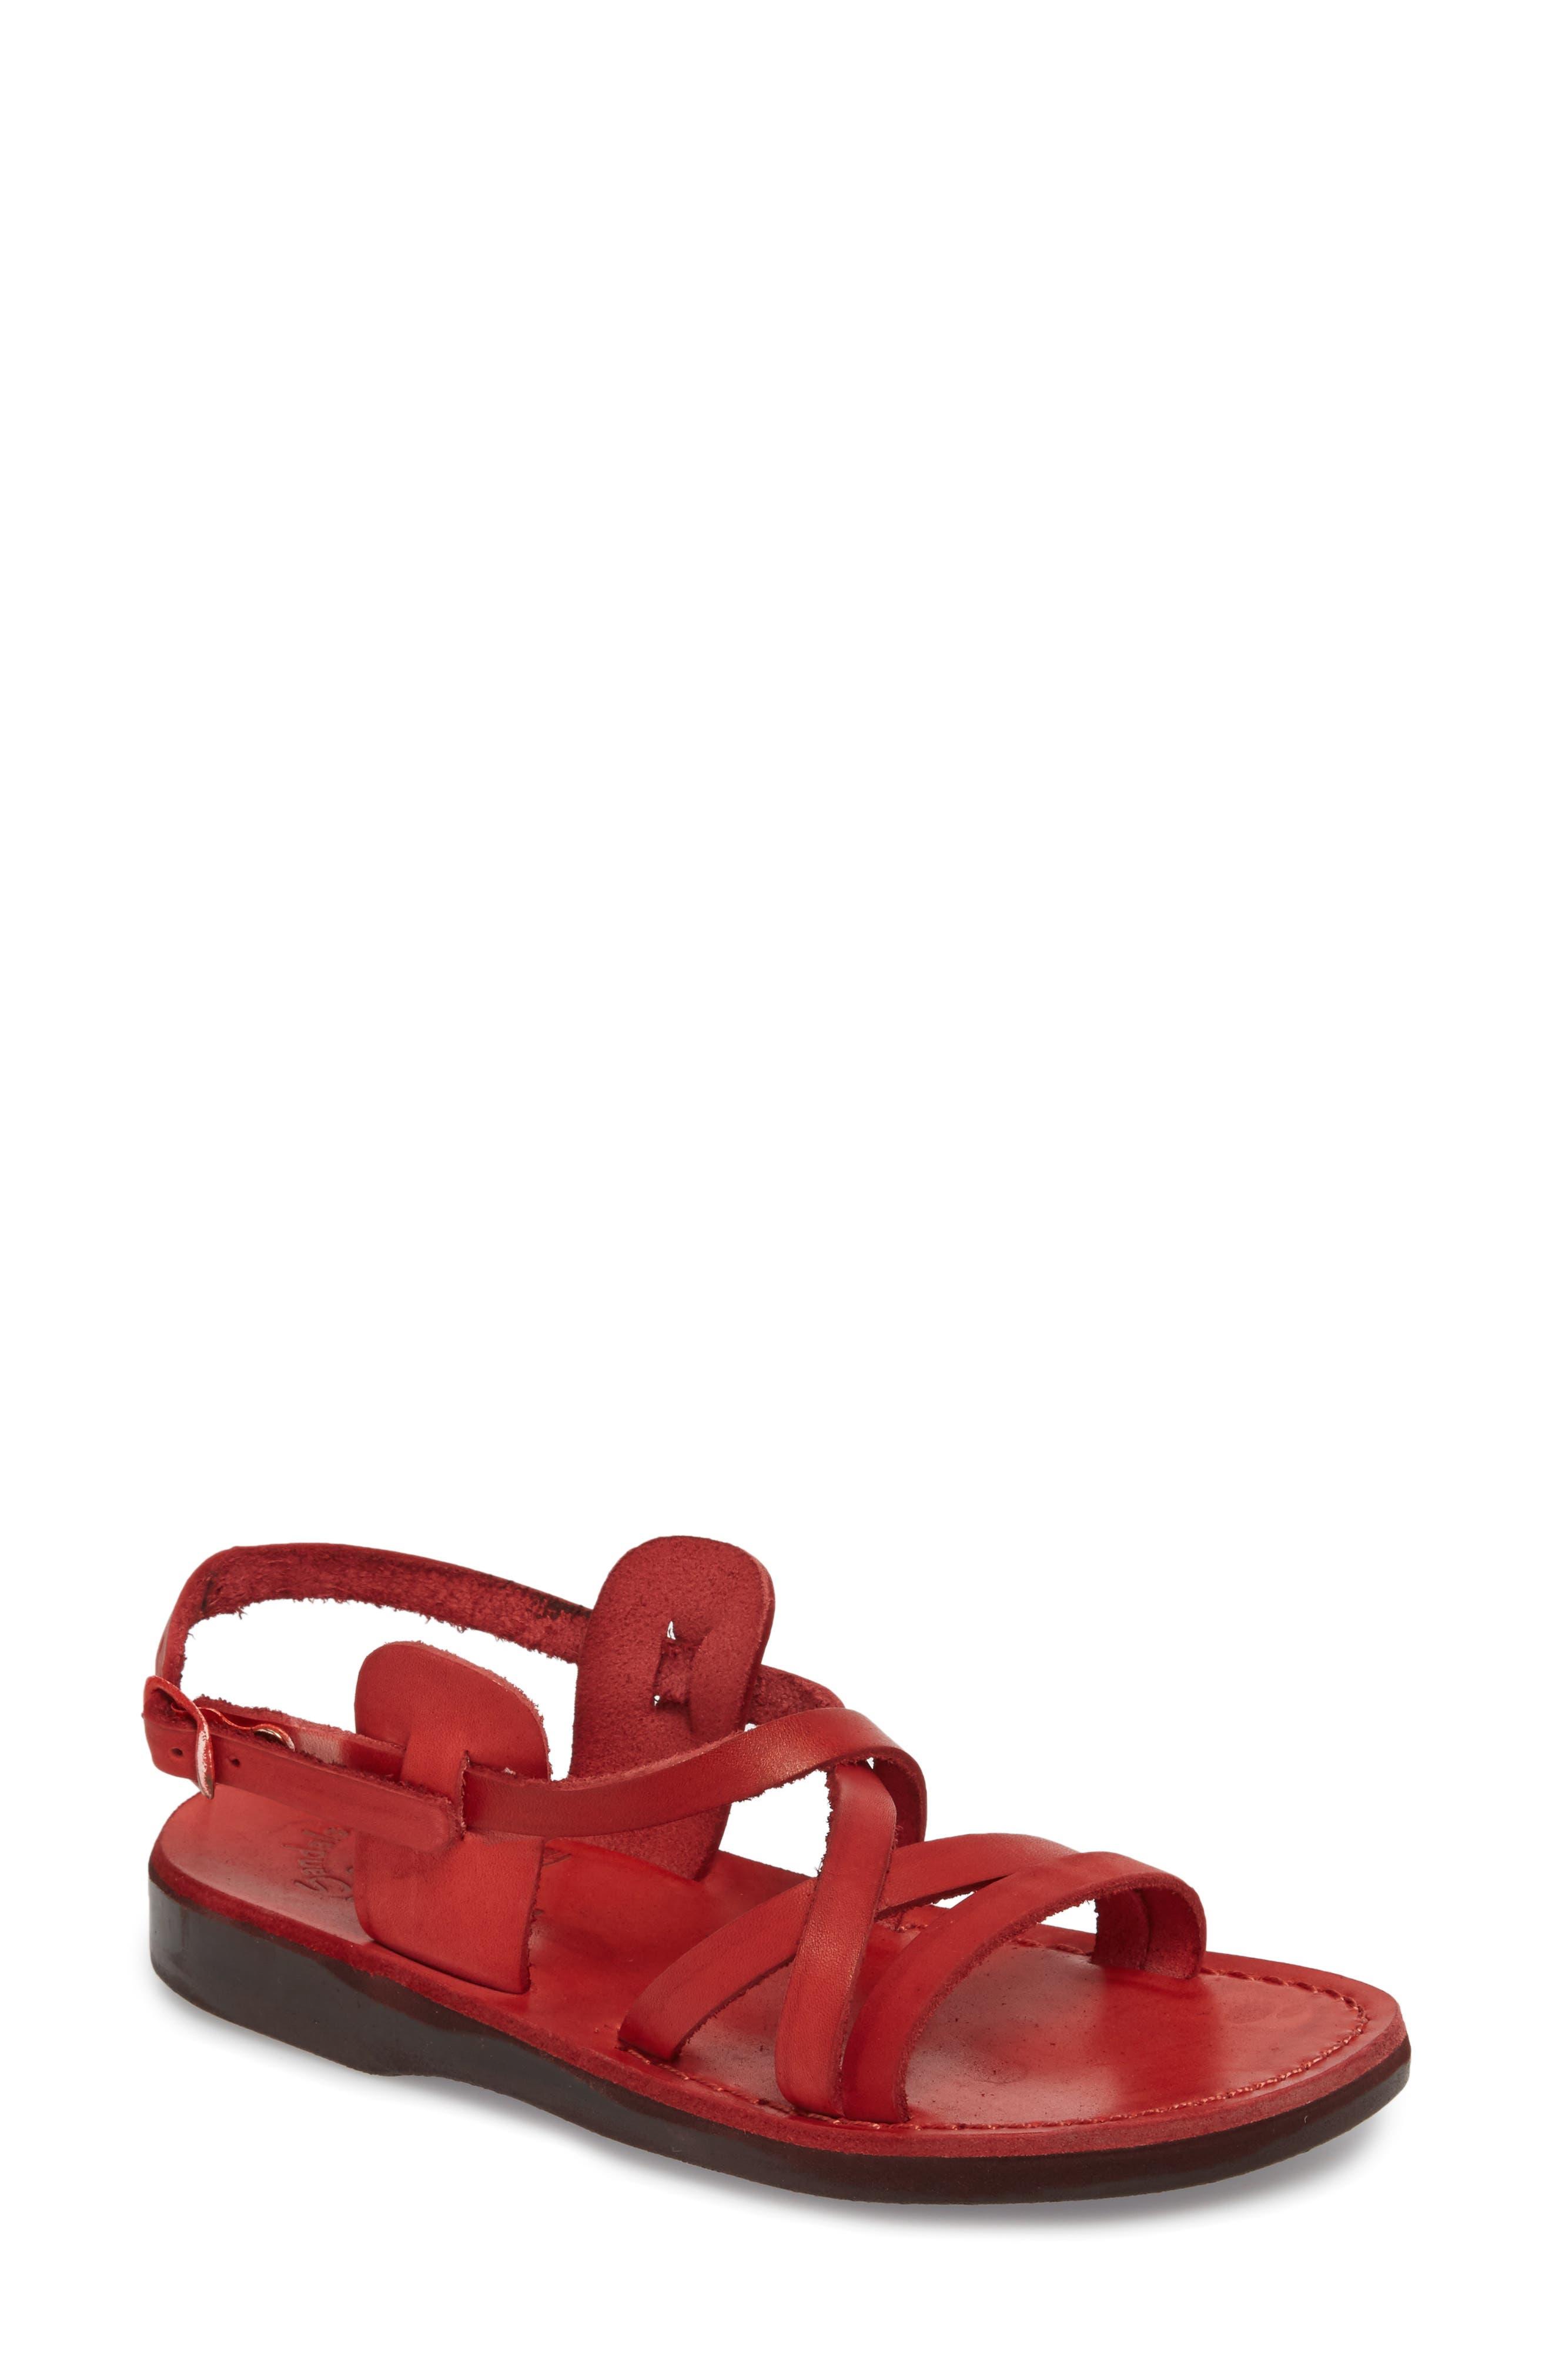 Alternate Image 1 Selected - Jerusalem Sandals Tzippora Slingback Sandal (Women)